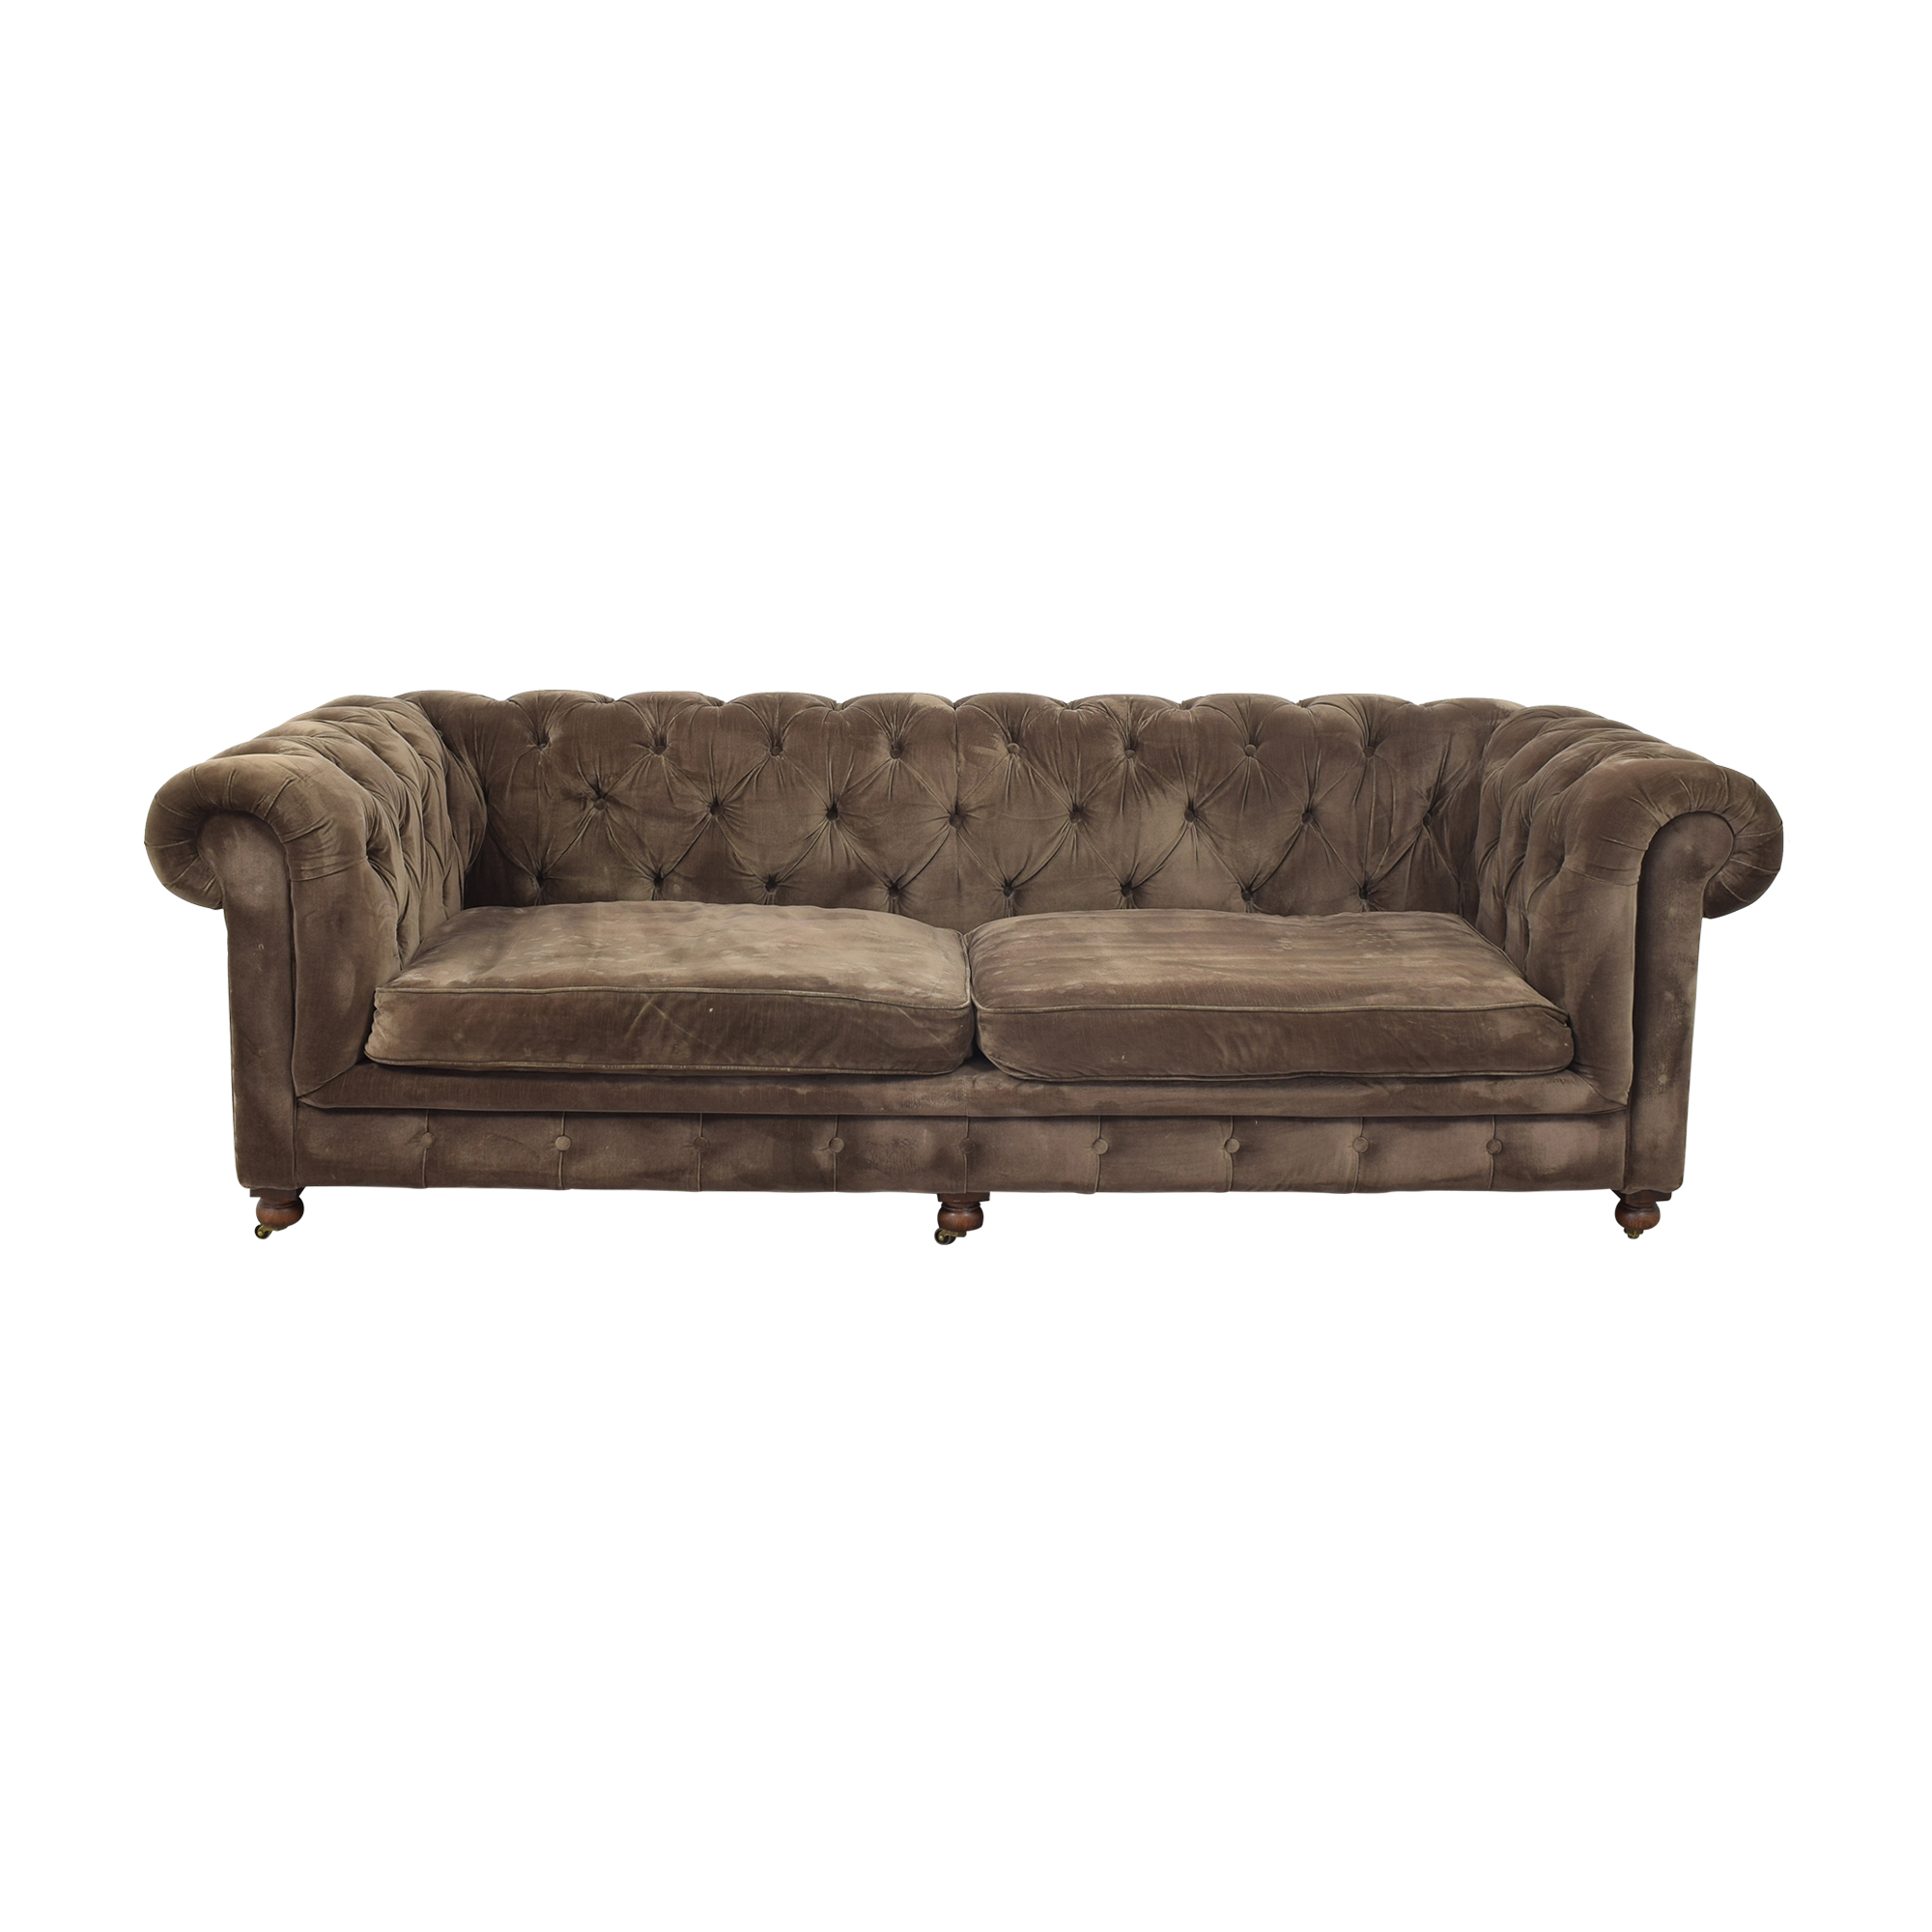 Restoration Hardware Restoration Hardware Kensington Sofa discount